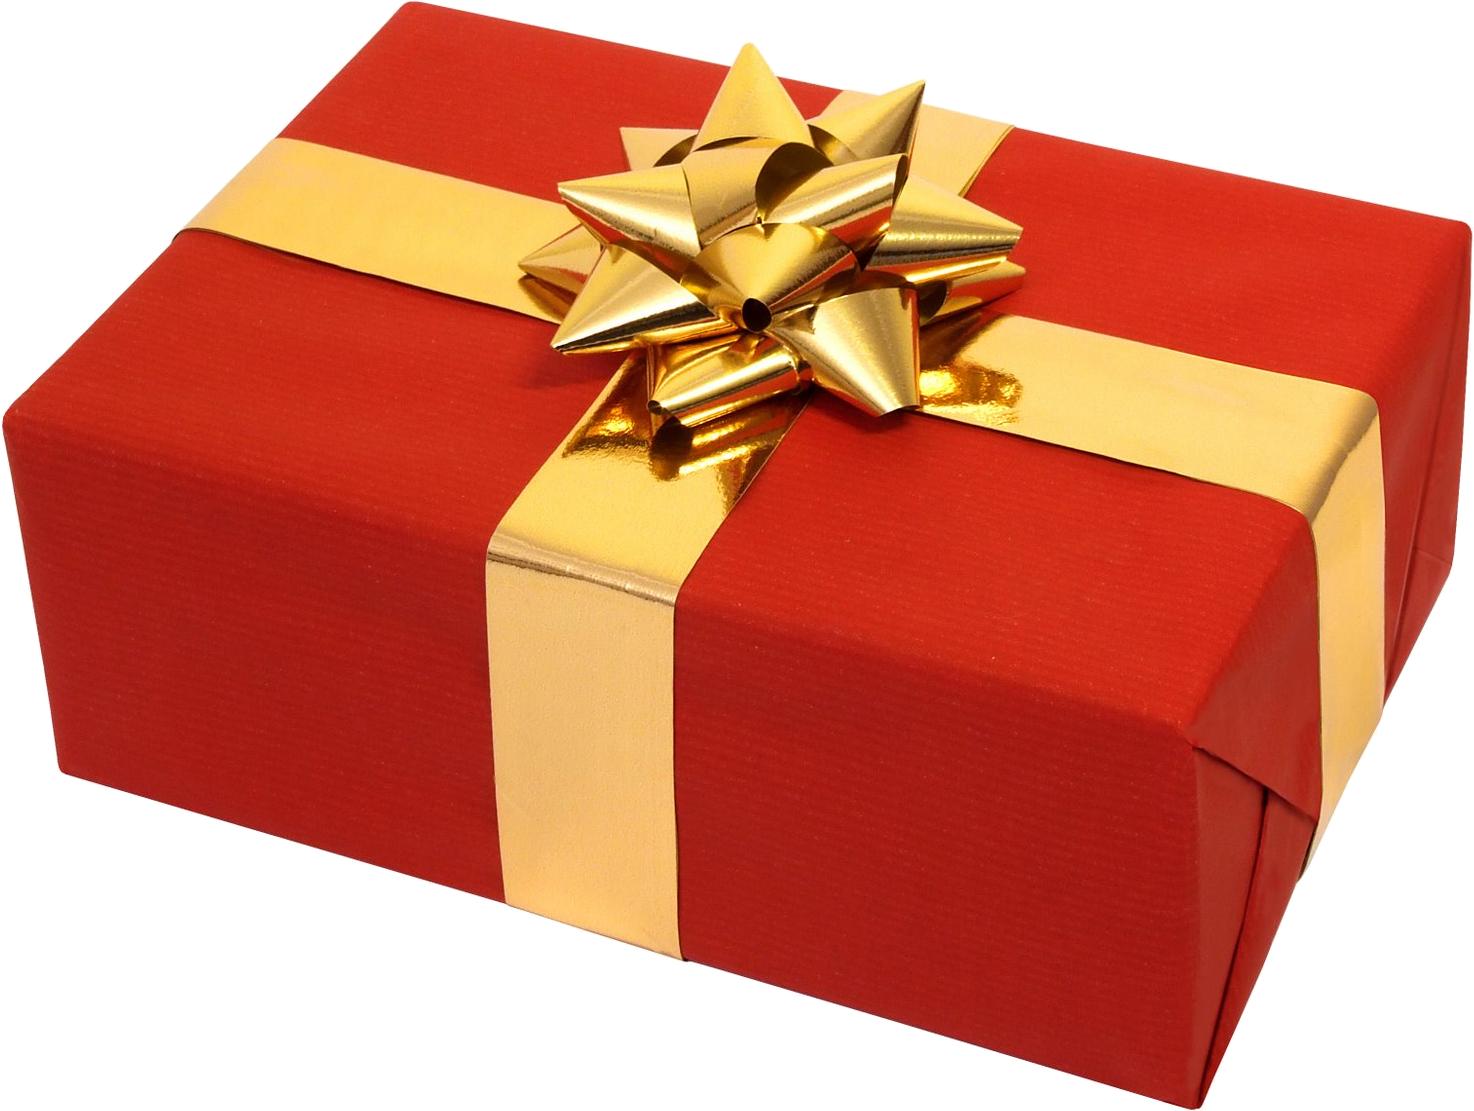 Gift Box Png Transparent image #39668